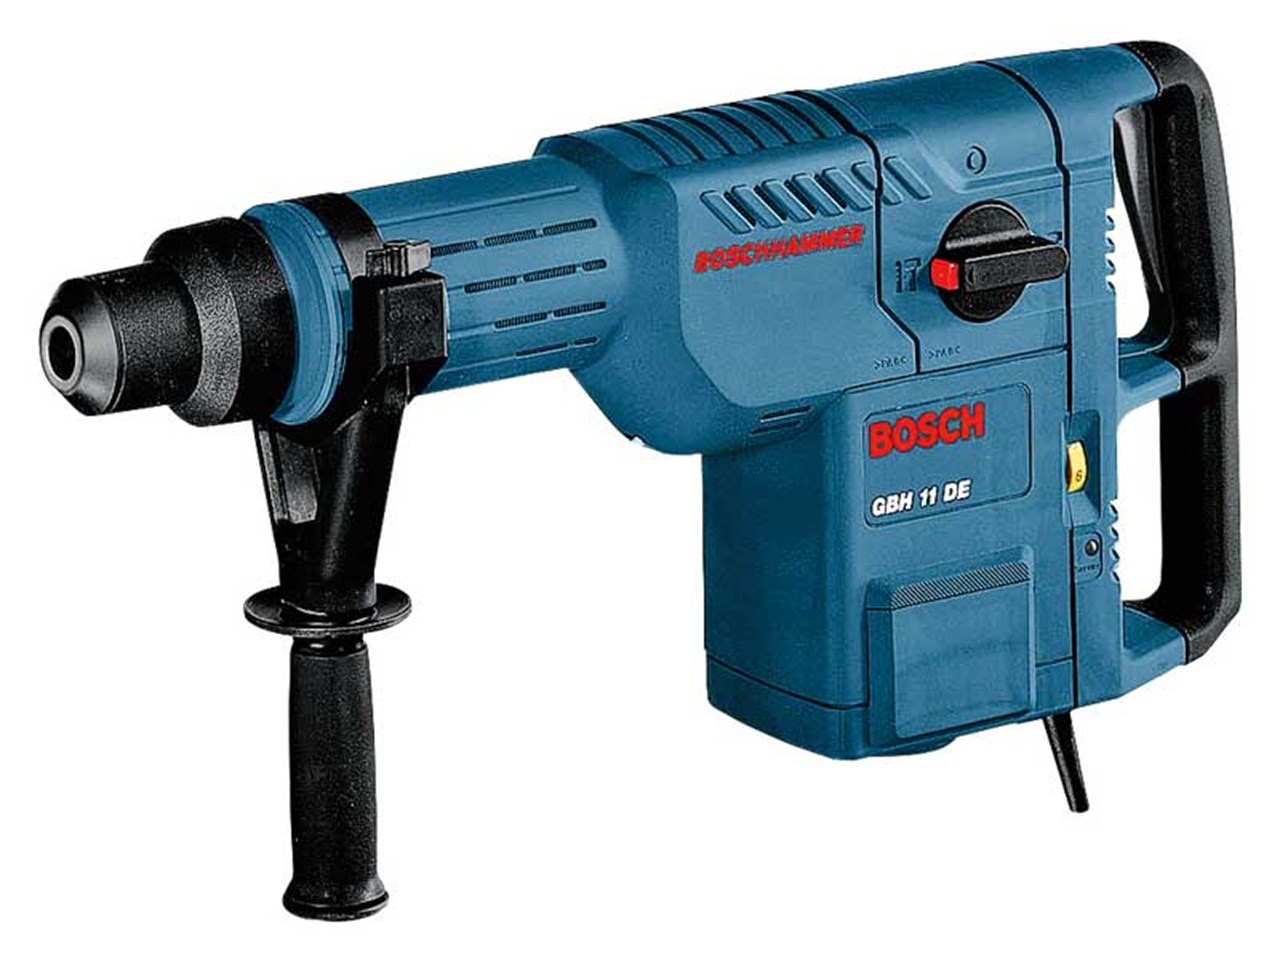 bosch gbh11de 110v sds max rotary combi hammer drill. Black Bedroom Furniture Sets. Home Design Ideas